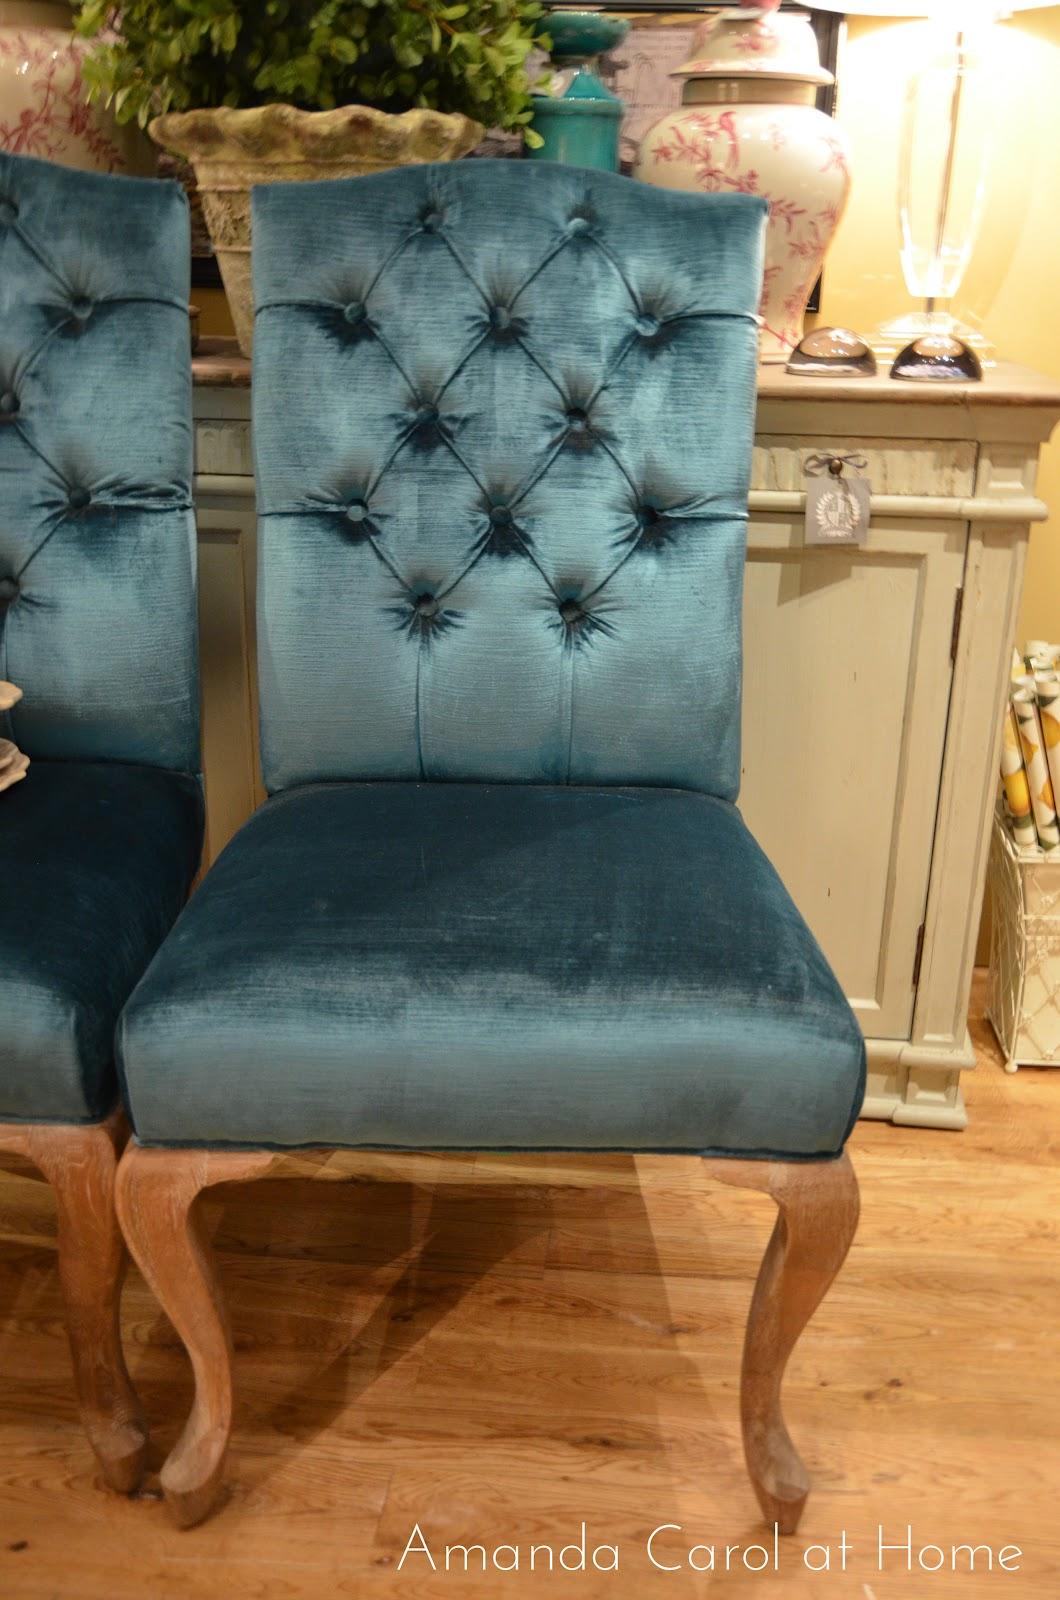 Shopping in london india jane amanda carol interiors for Cameron tufted chaise peacock